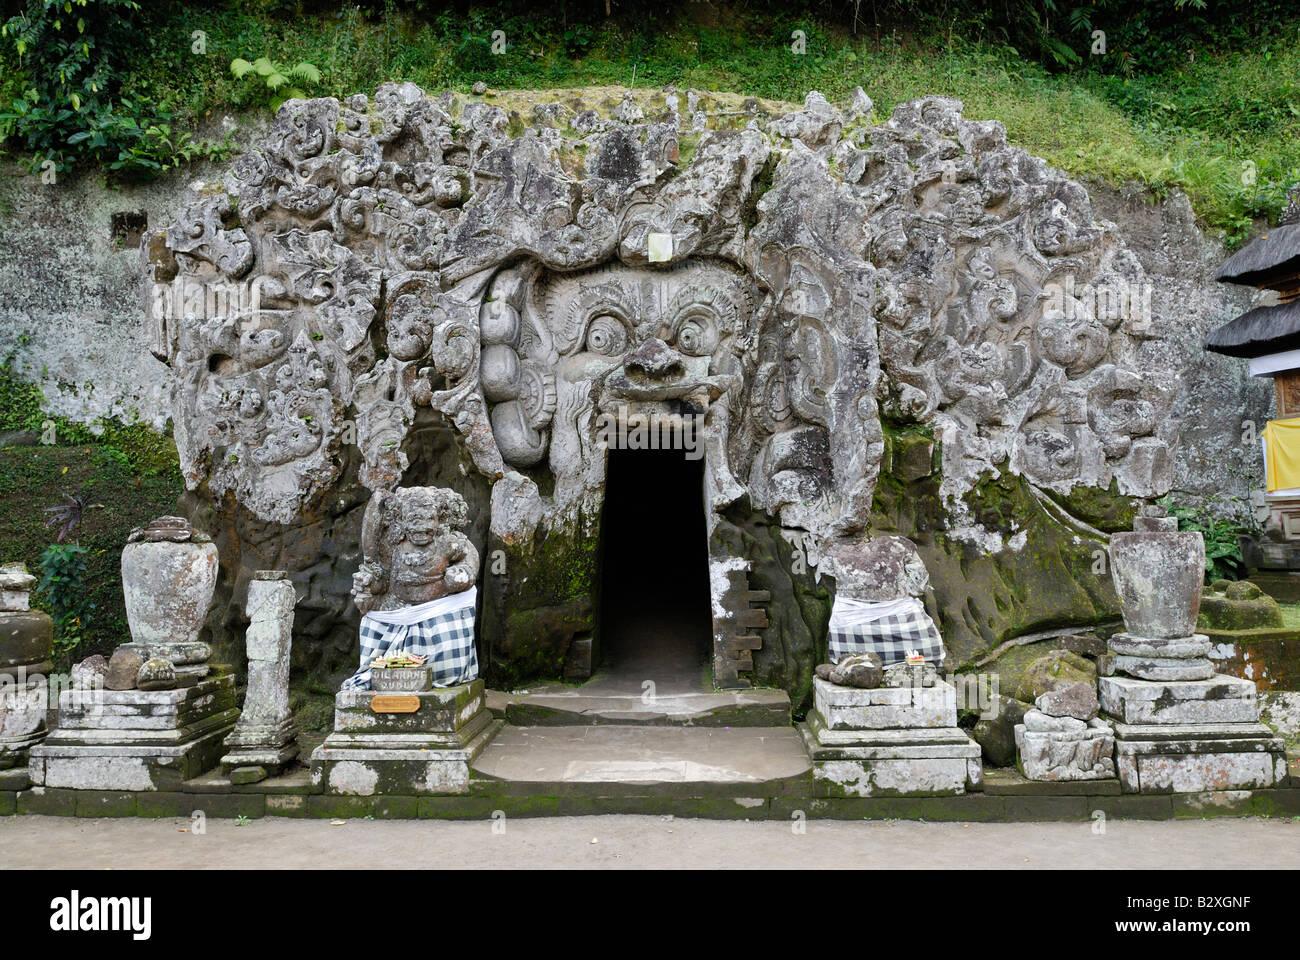 ELEFANTENHÖHLE Goa Gajah, Bali, Indonesien, Asien Stockbild